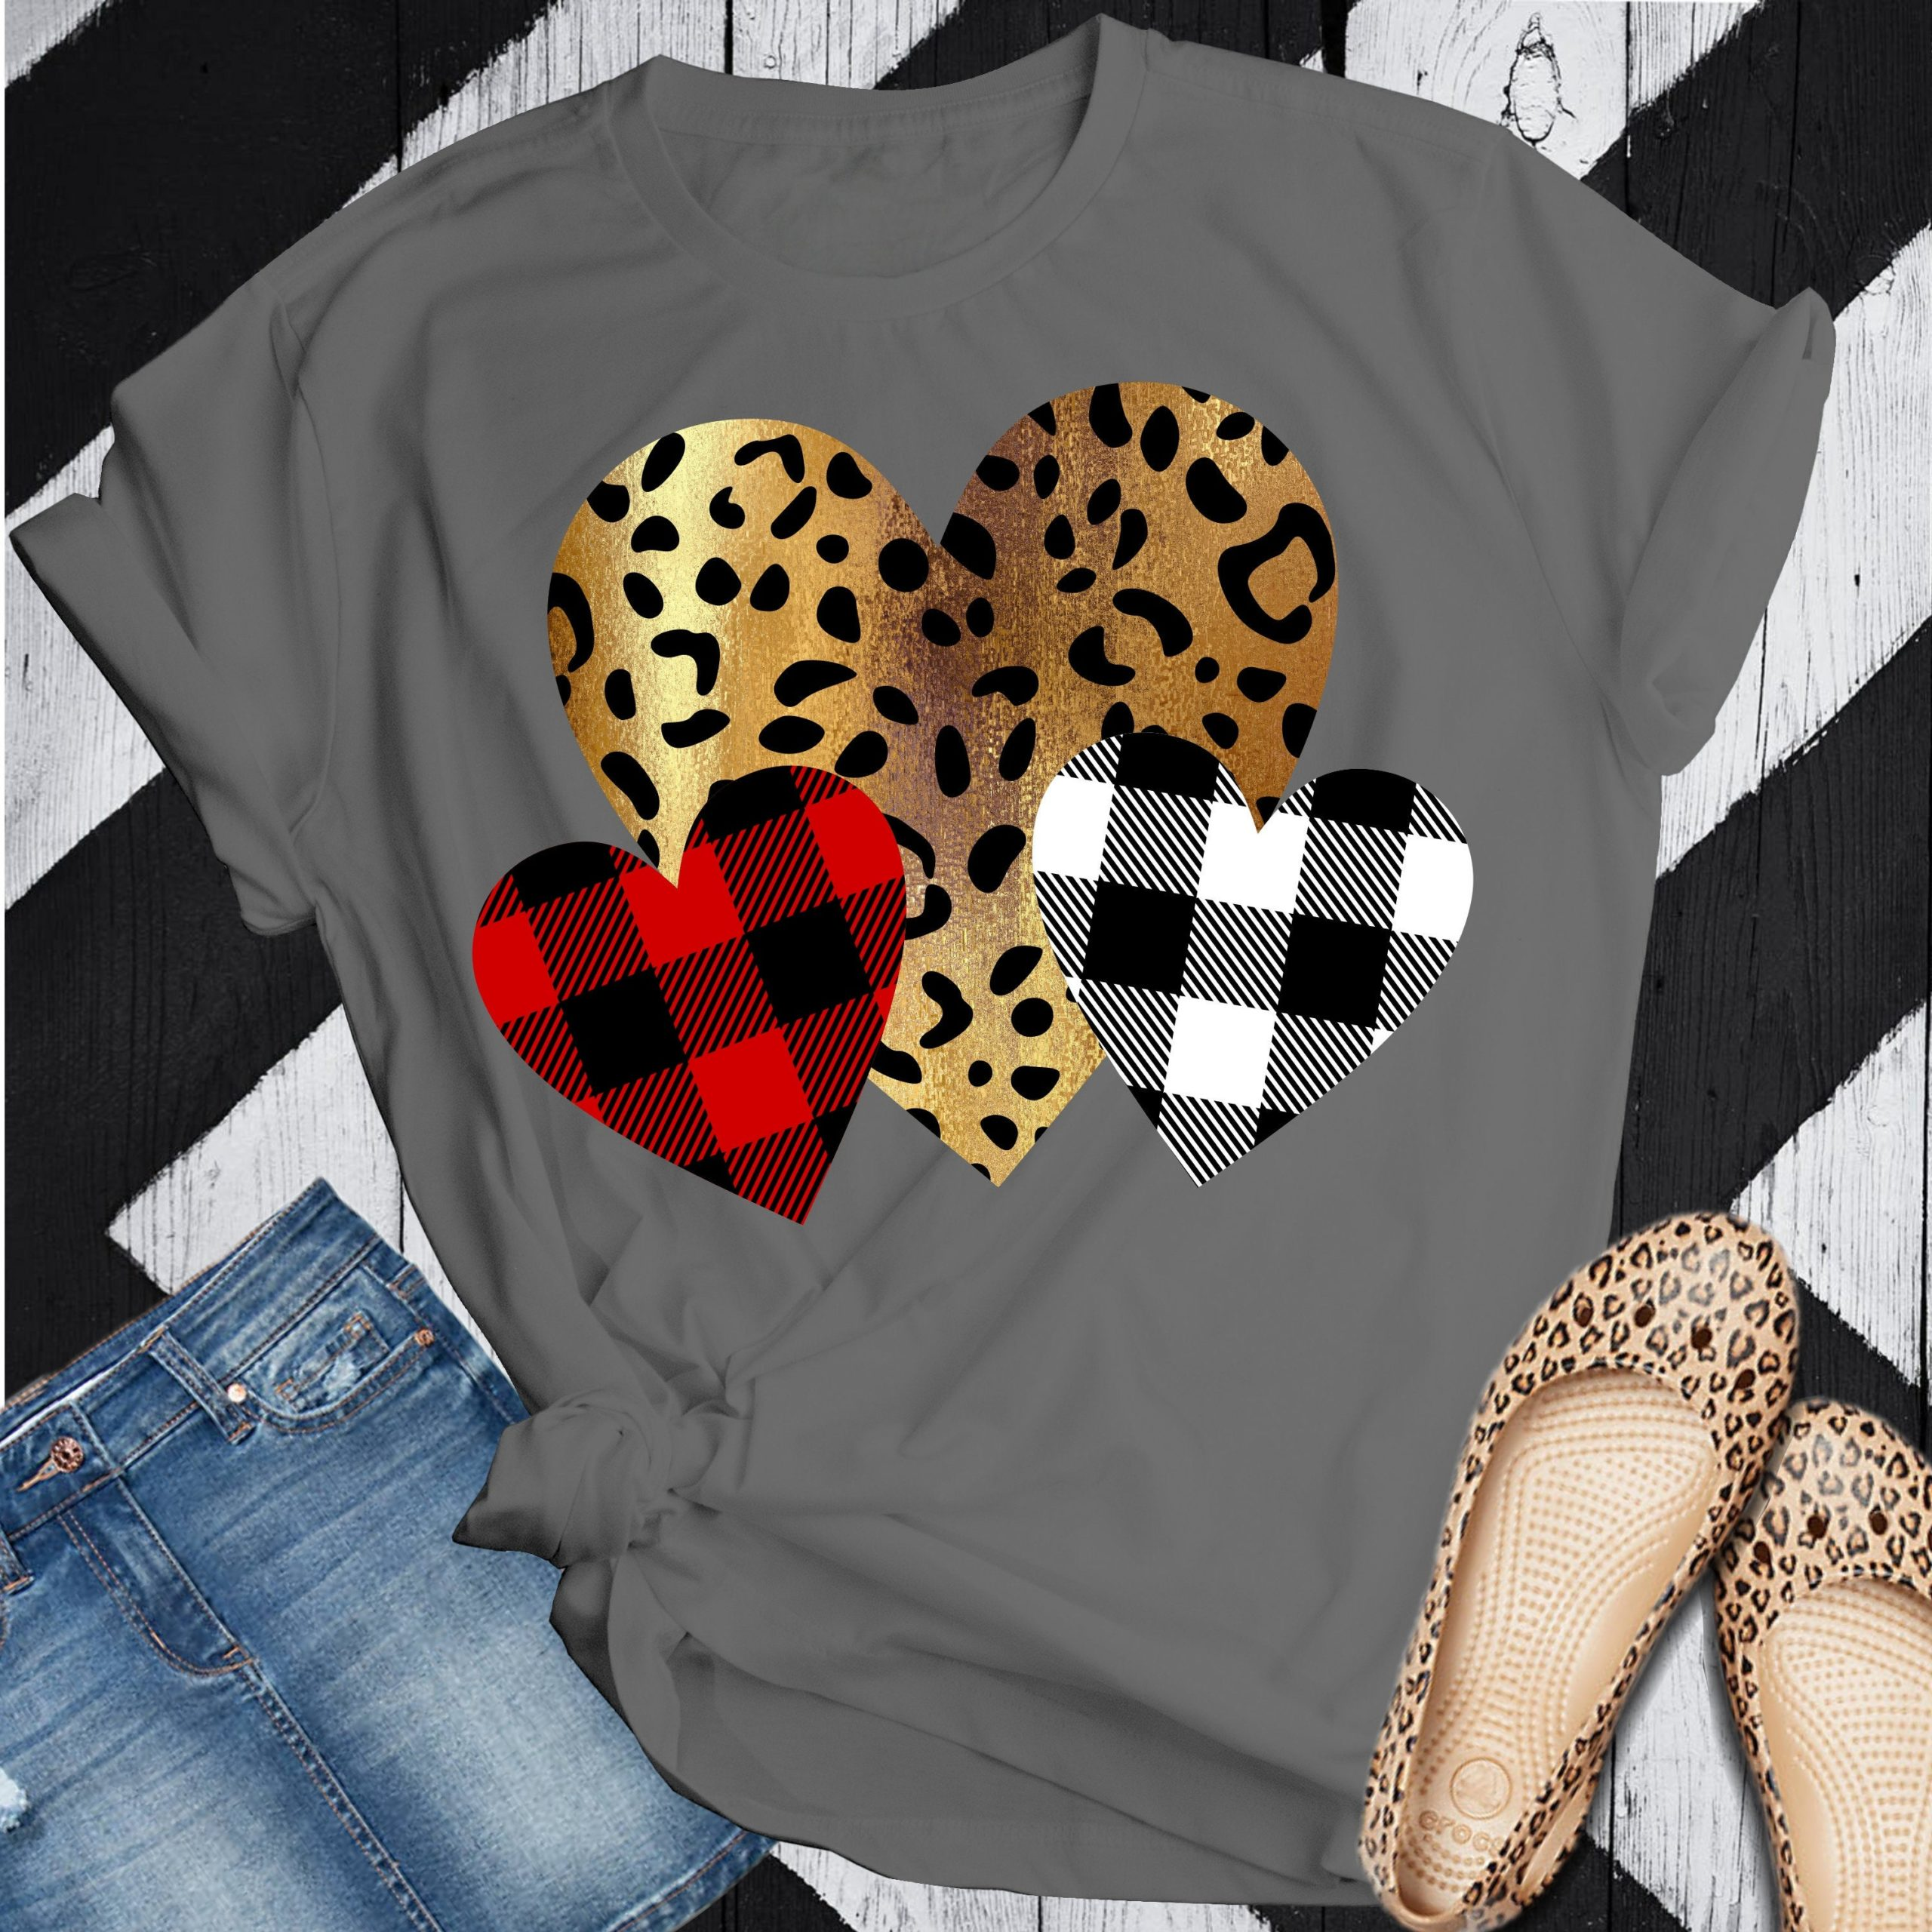 png Valentine svg jpg heart svg file Valentine heart svg heart cut file free commercial use svg heart svg Valentine/'s day svg